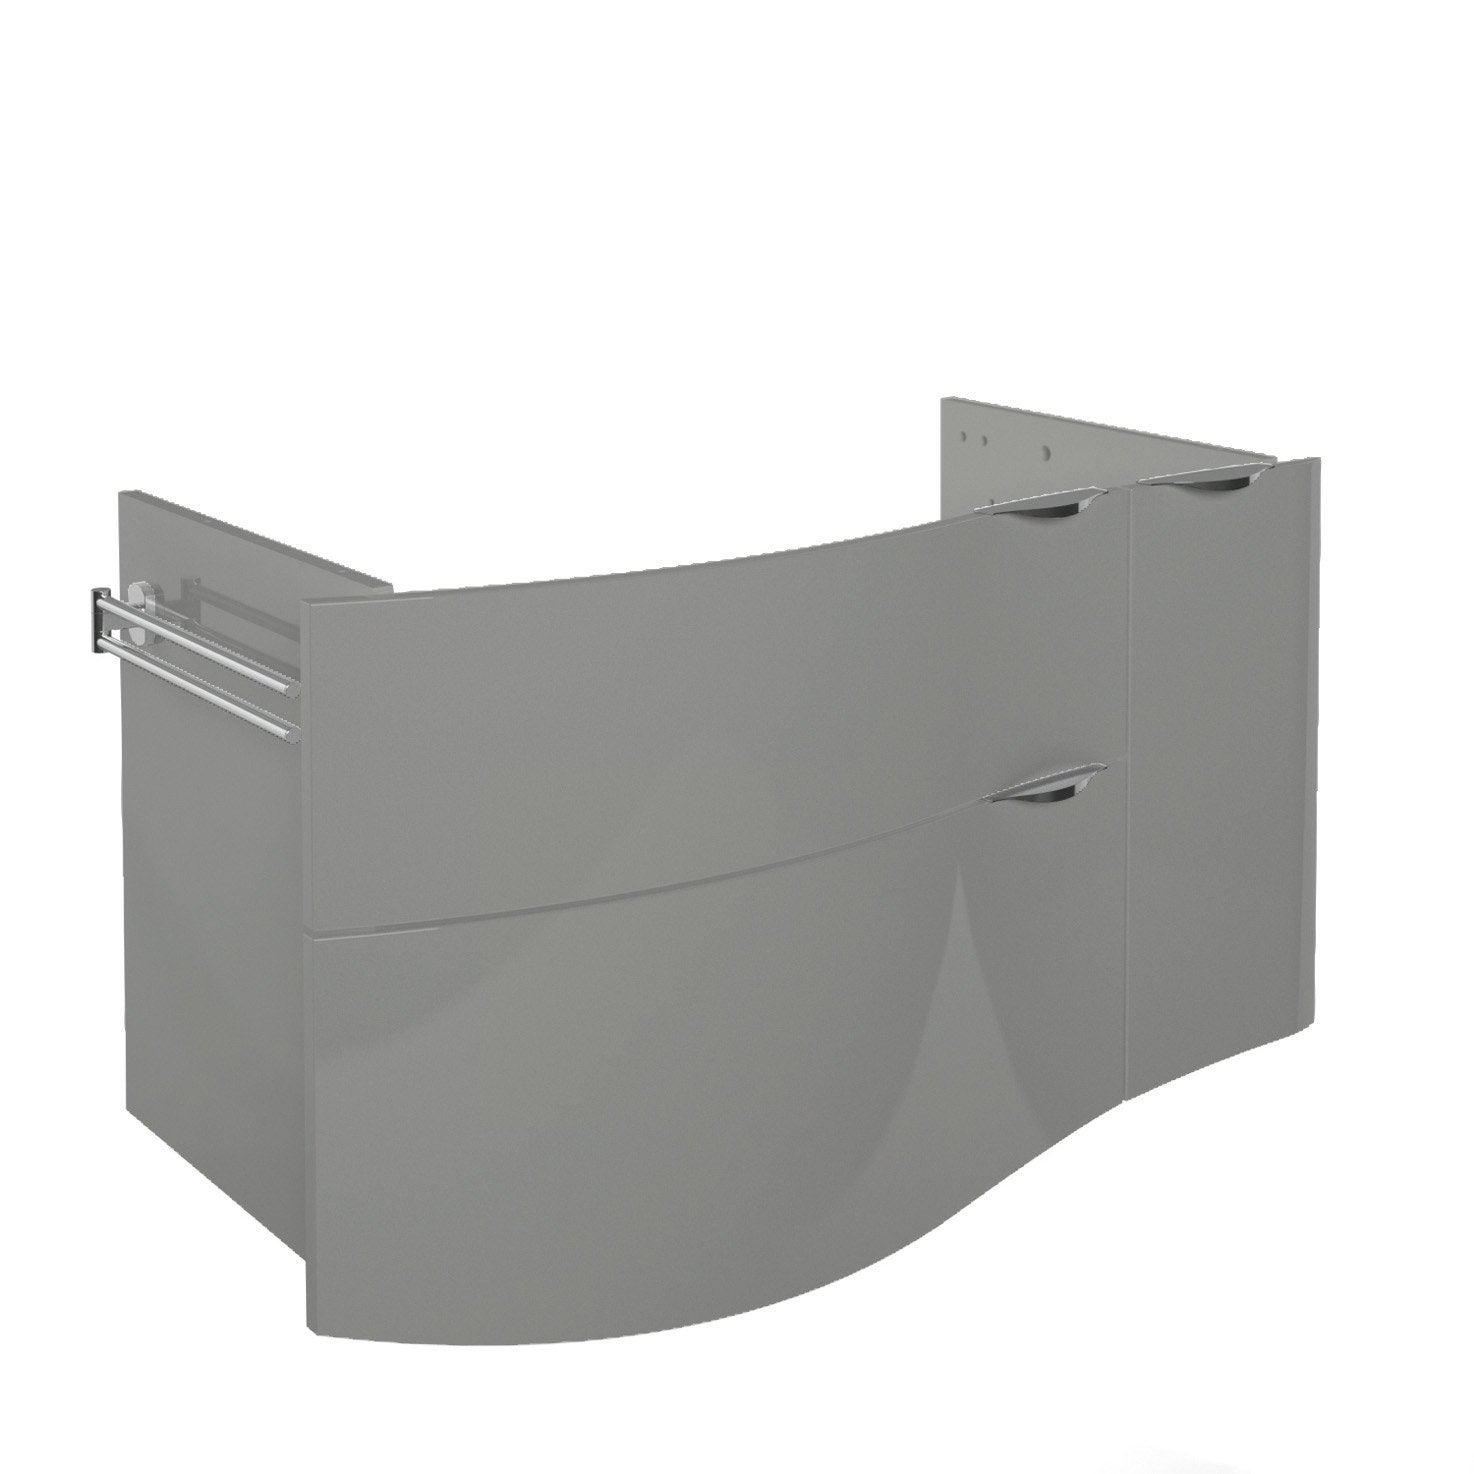 Meuble sous vasque x x cm elegance for Meuble 2 vasques leroy merlin